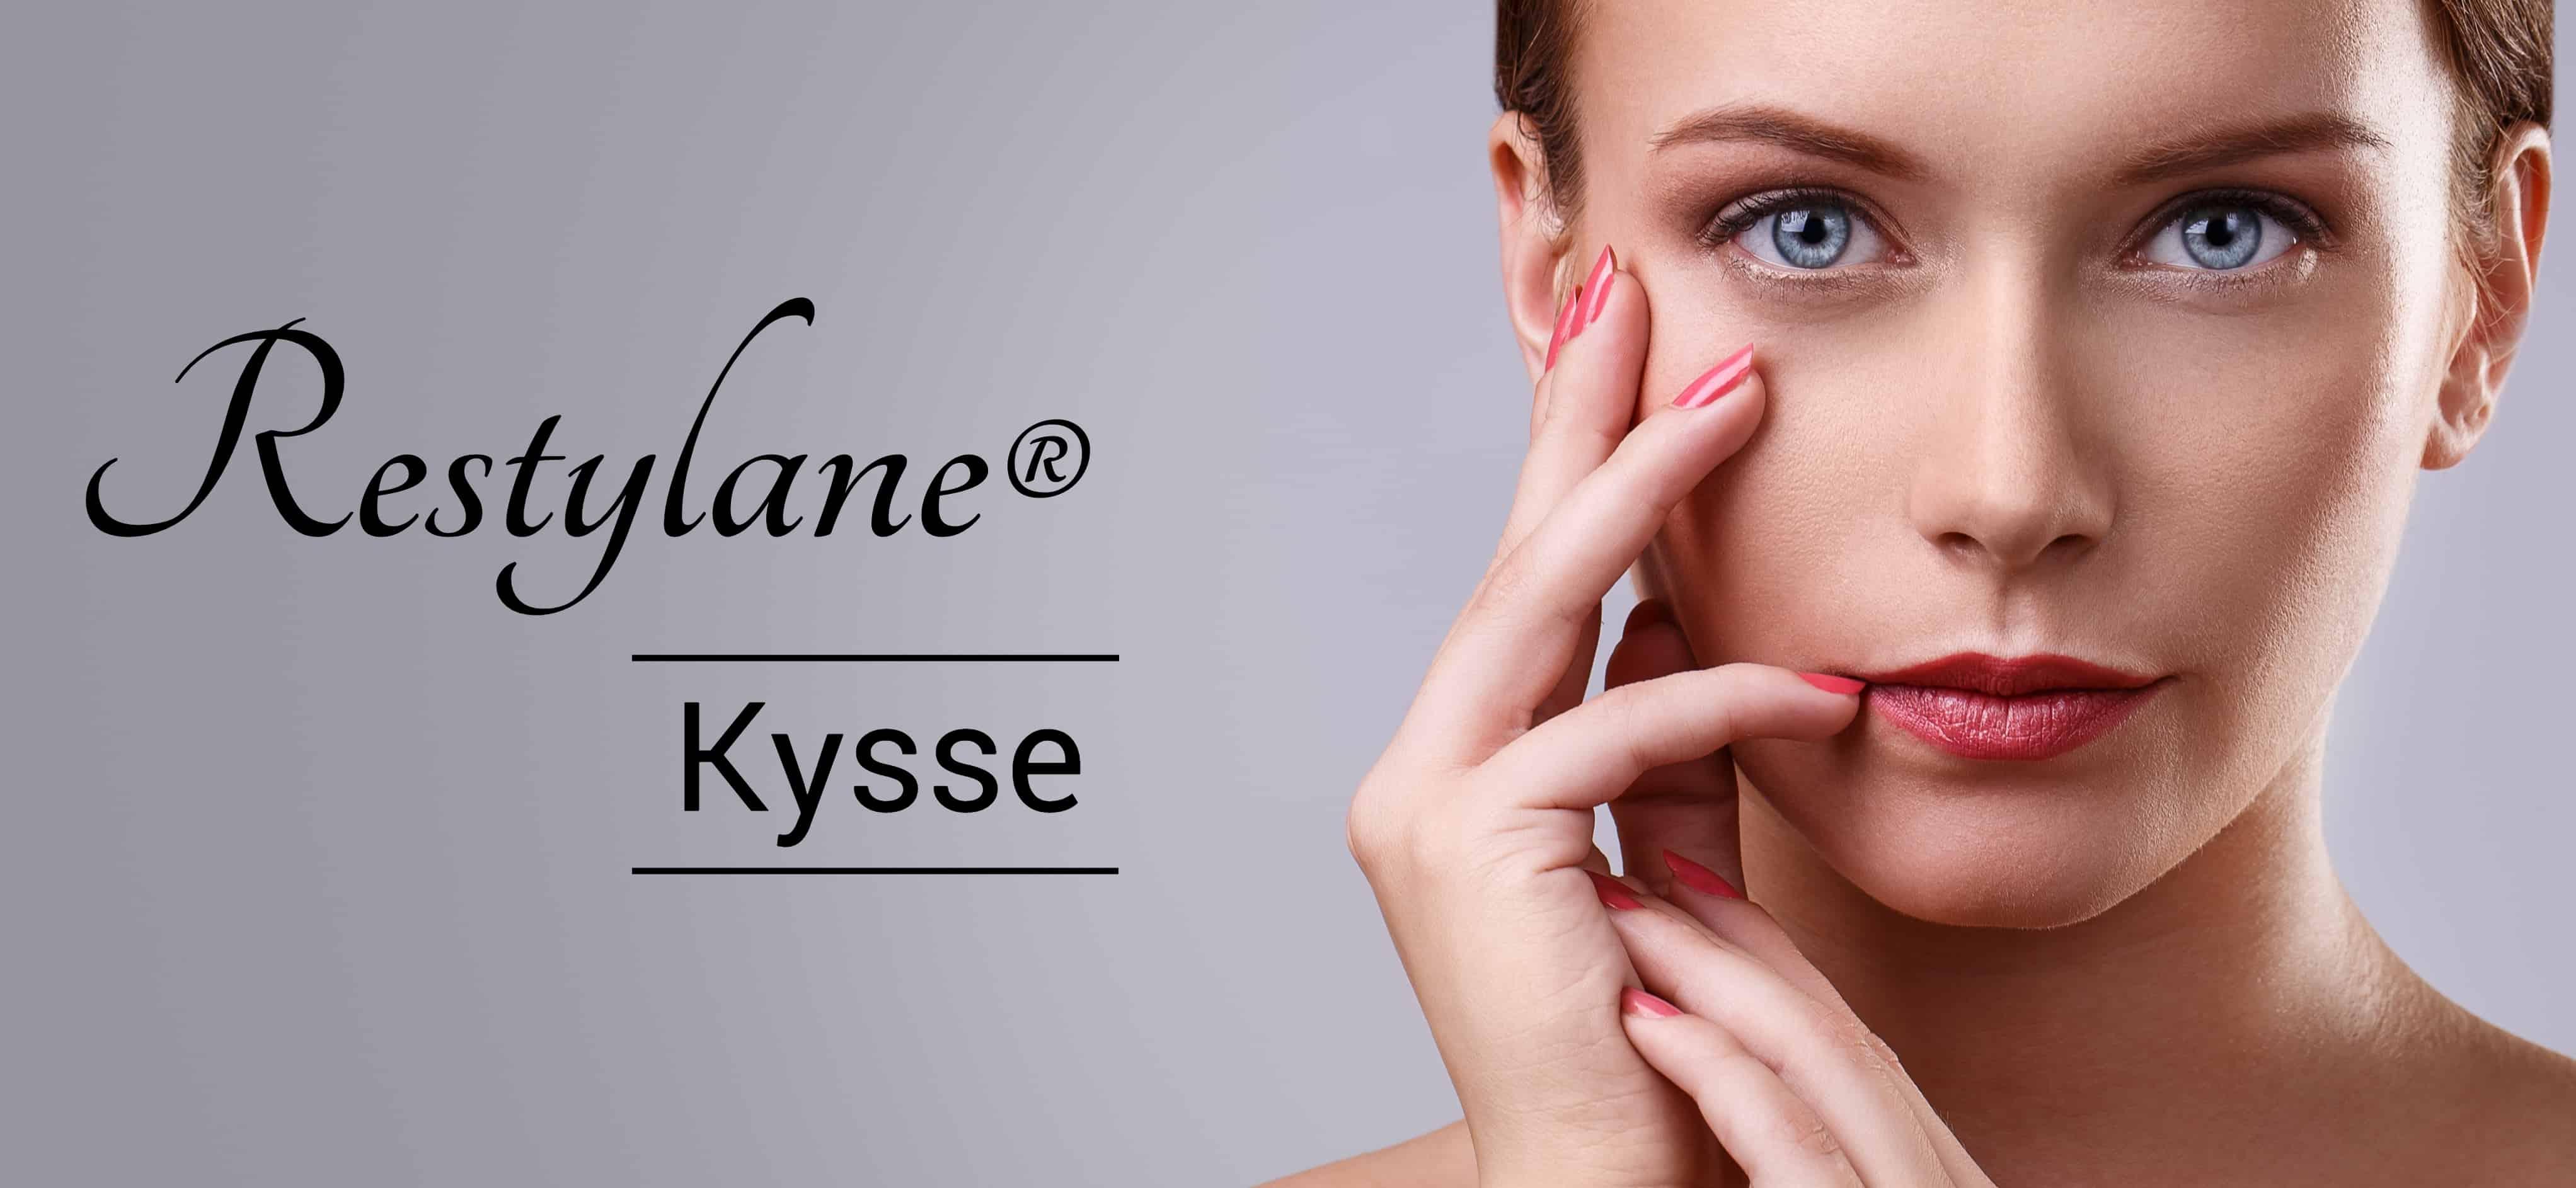 Restylane® Kysse